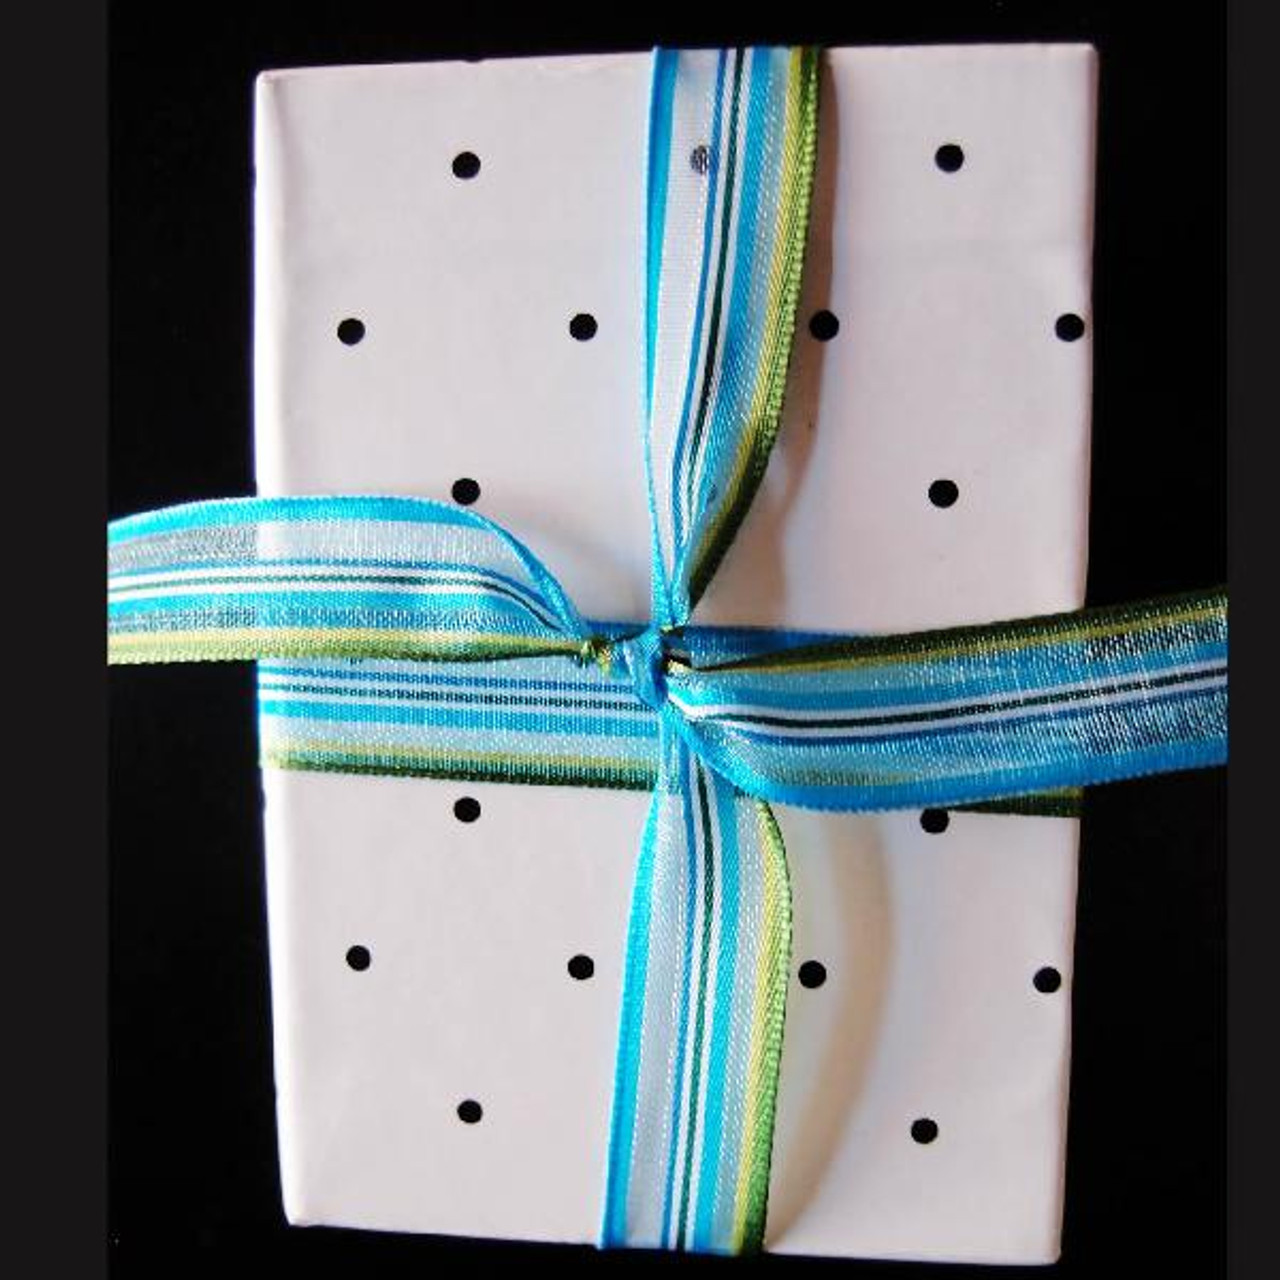 White-Blue-Green Multi-Stripes Sheer Ribbon